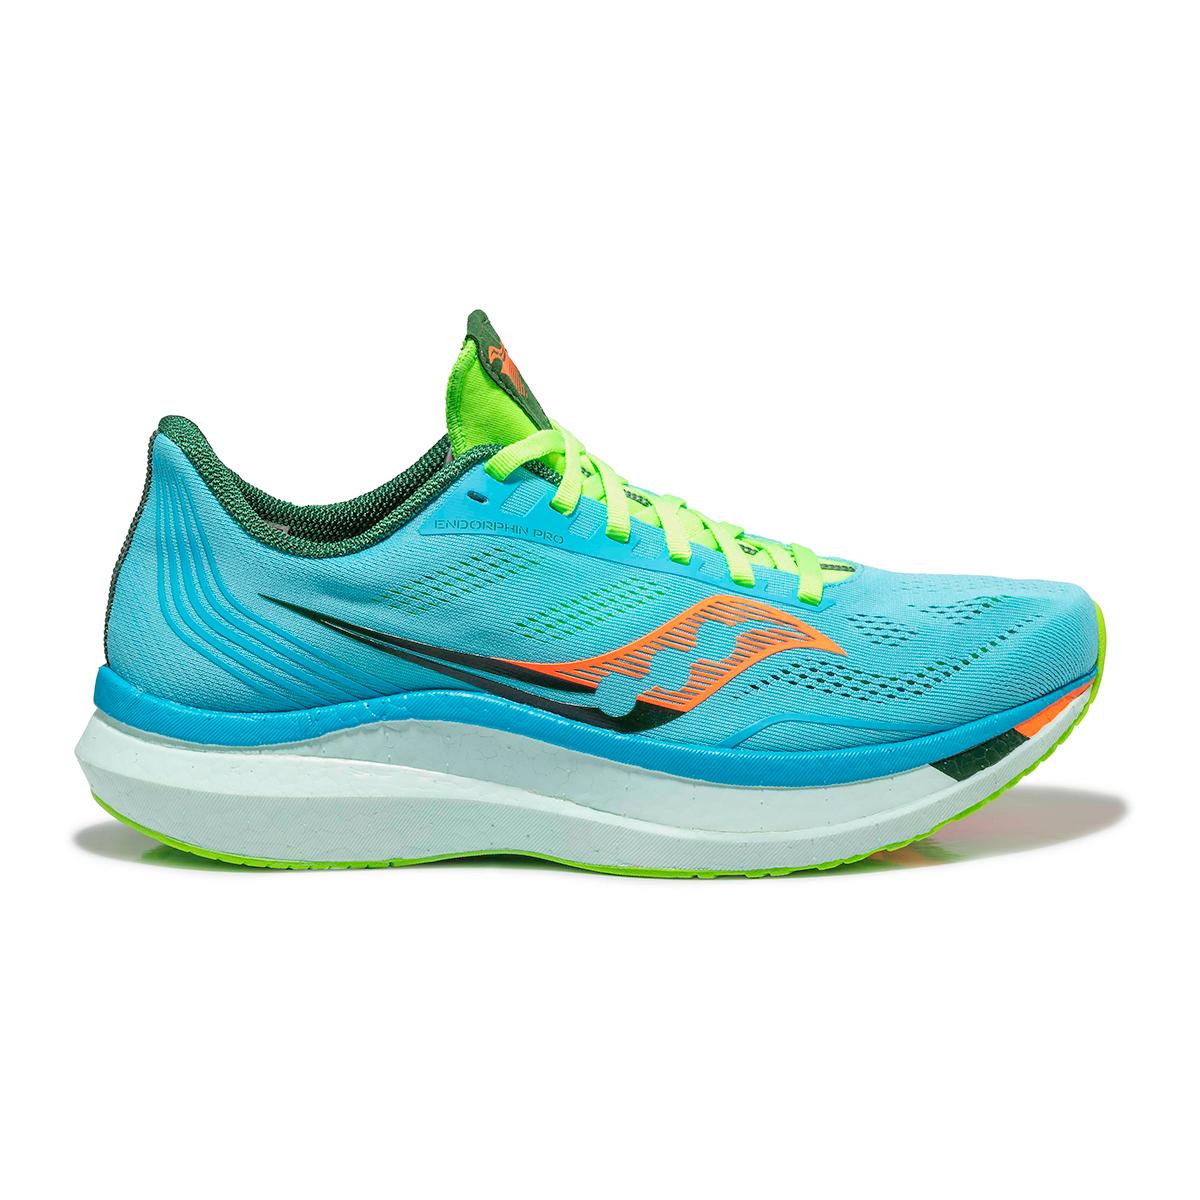 Men's Saucony Endorphin Pro Running Shoe - Color: Future/Blue - Size: 7 - Width: Regular, Future/Blue, large, image 1